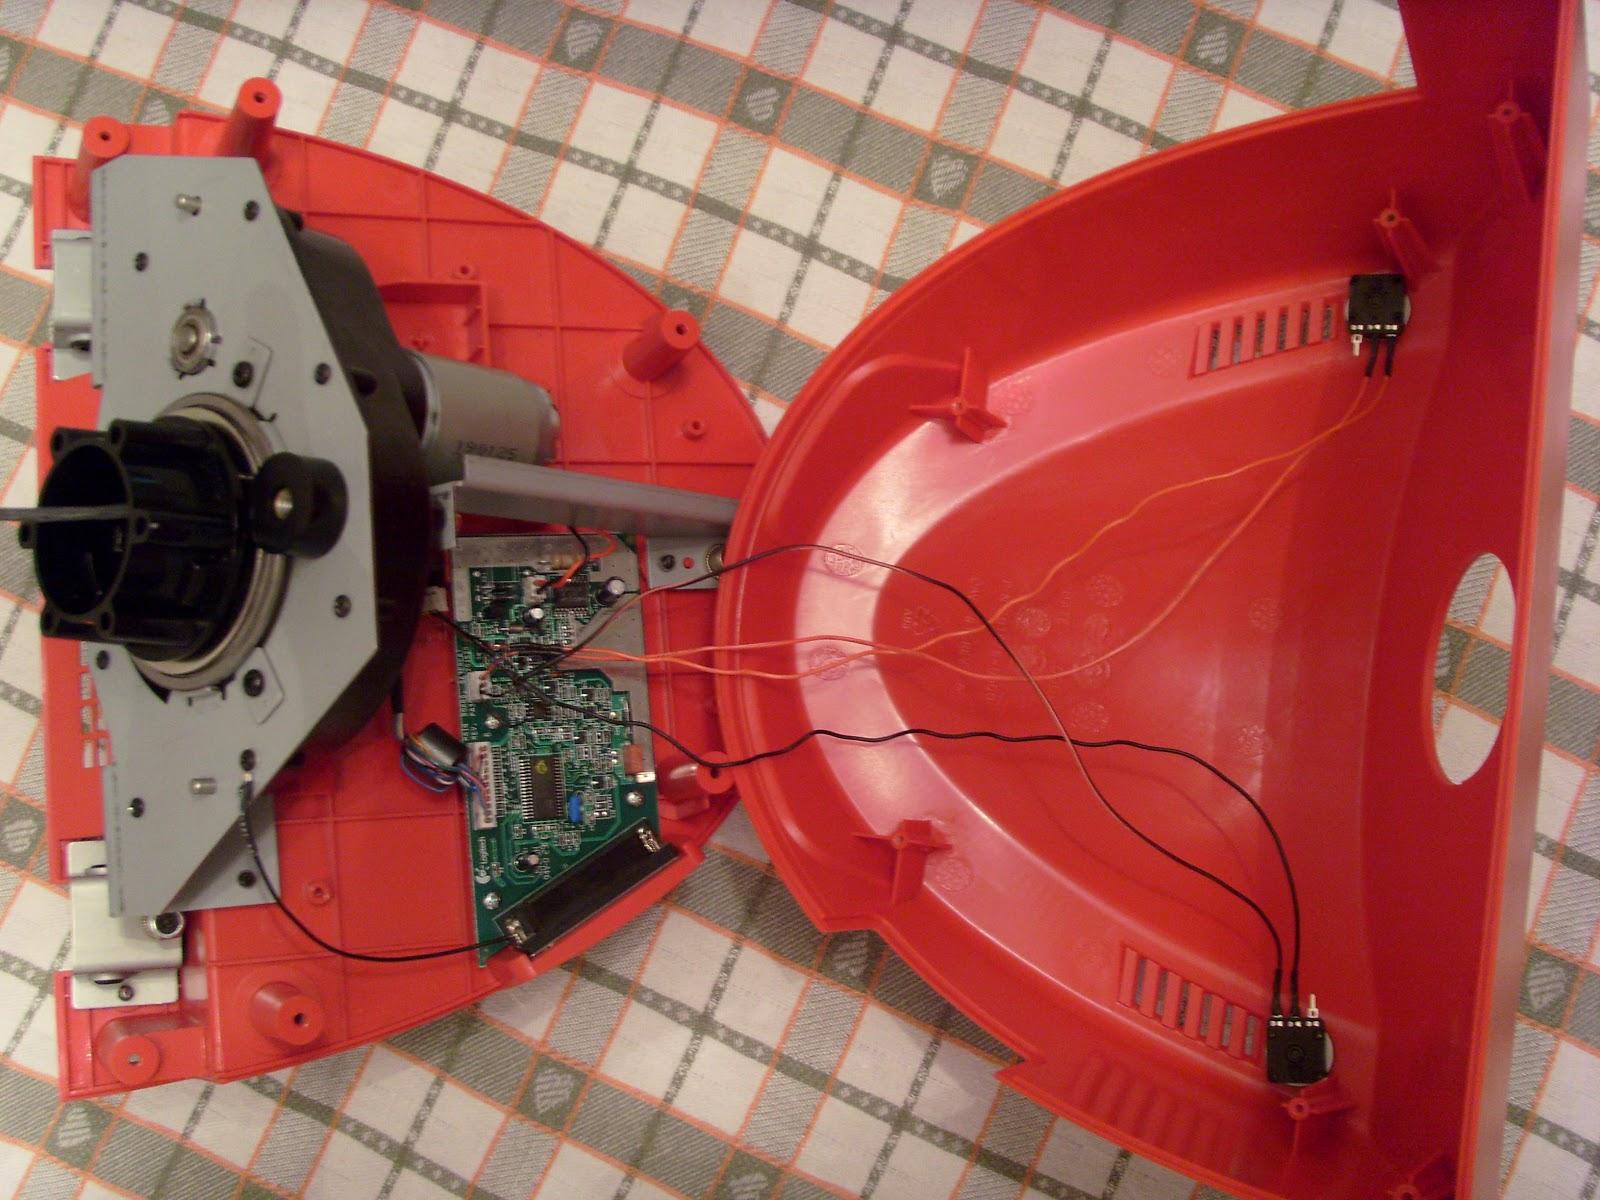 Momo Logitech Circuit Board Webcam Filter Removal Freetrack Wireless Mouse M325 910 002416